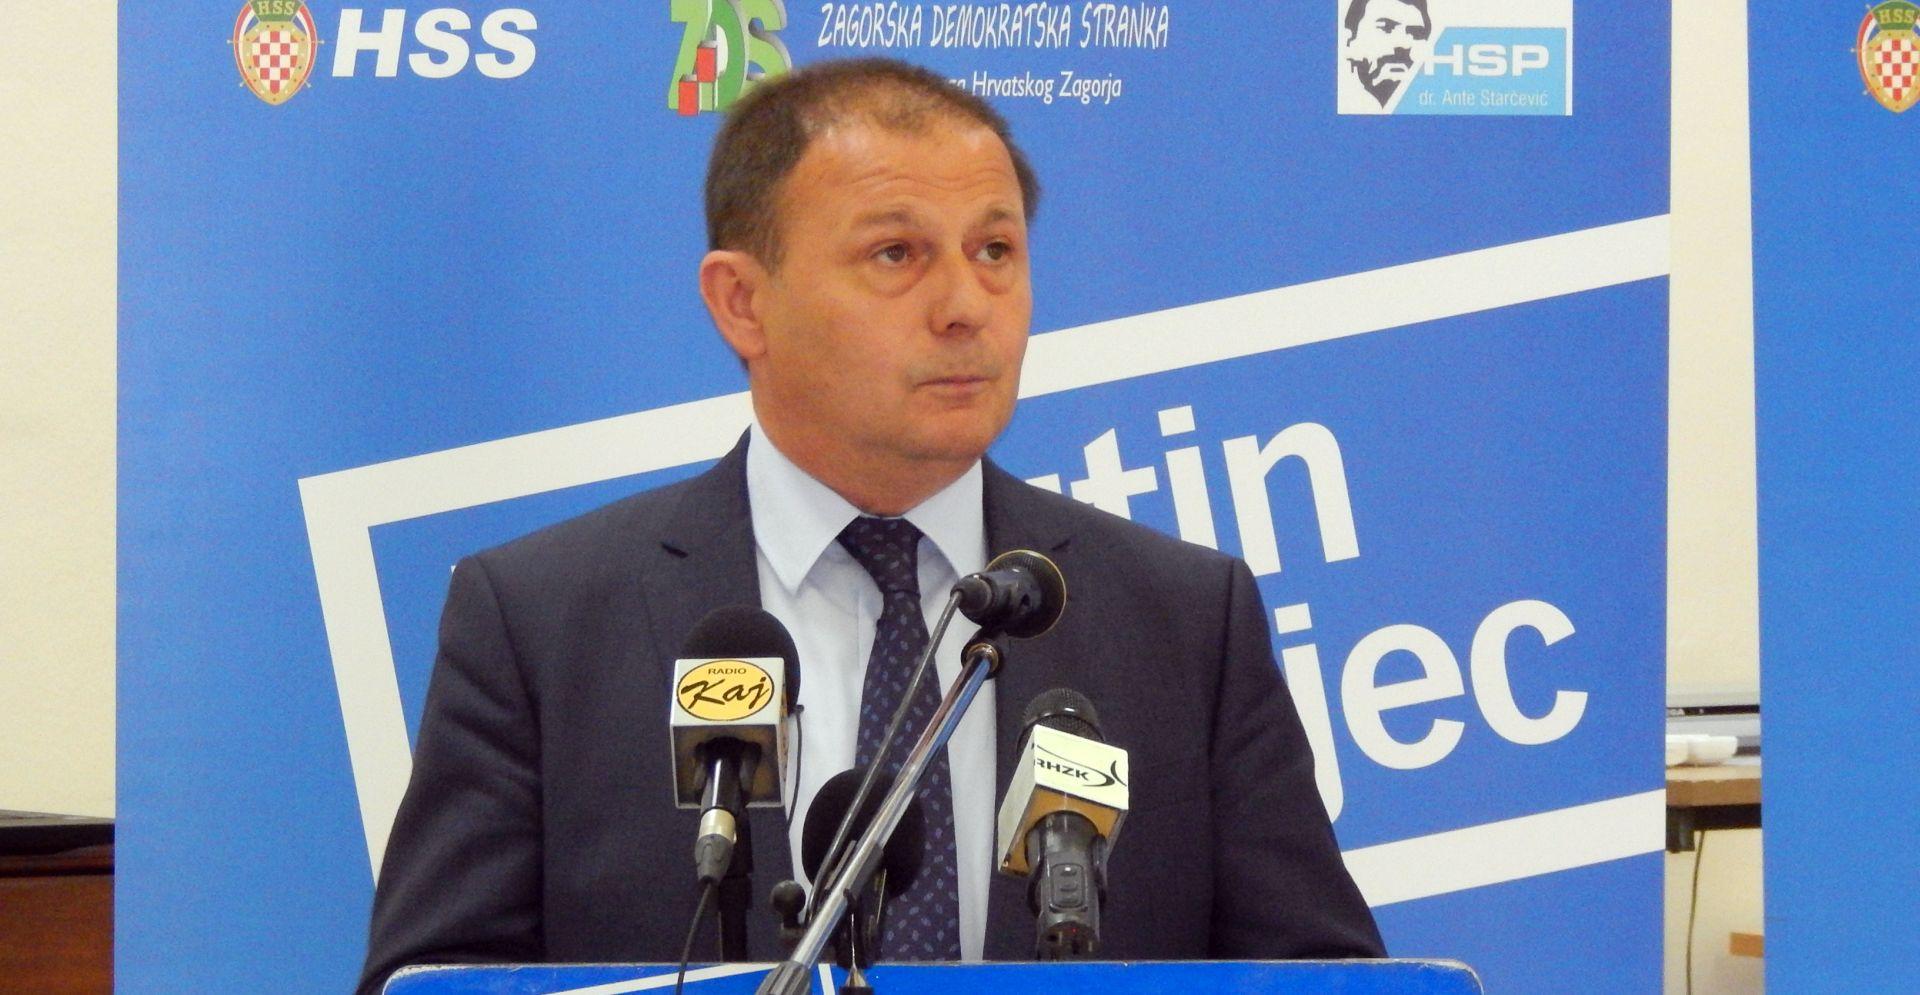 RANOGAJEC 'Zagorje treba zaposliti i osigurati pravednost i solidarnost'